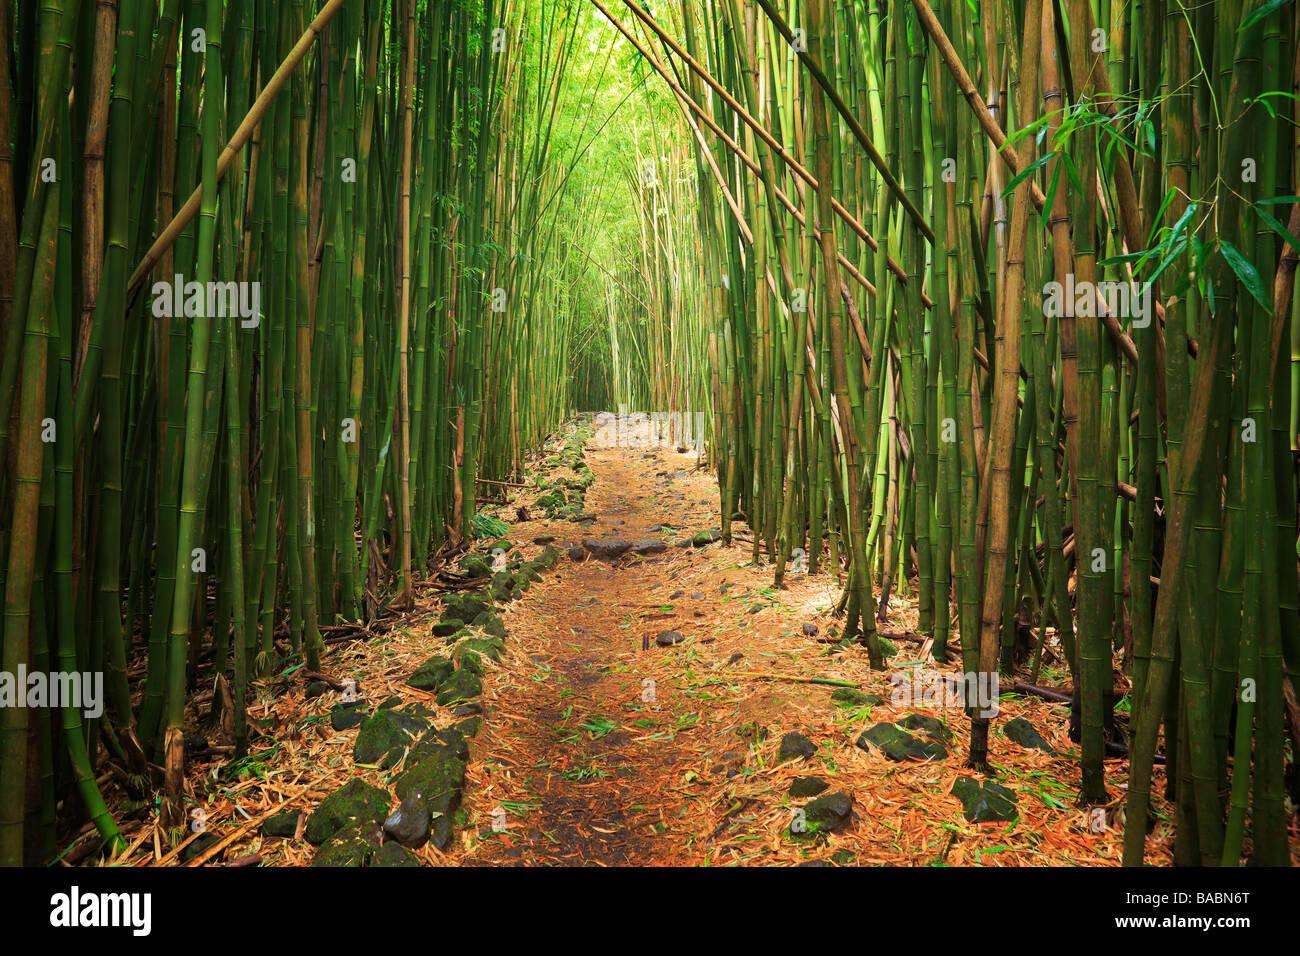 Bamboo forest along the Pipiwai trail to Waimoku Fall in the Kipahulu area of Haleakala National Park in Maui Hawaii - Stock Image